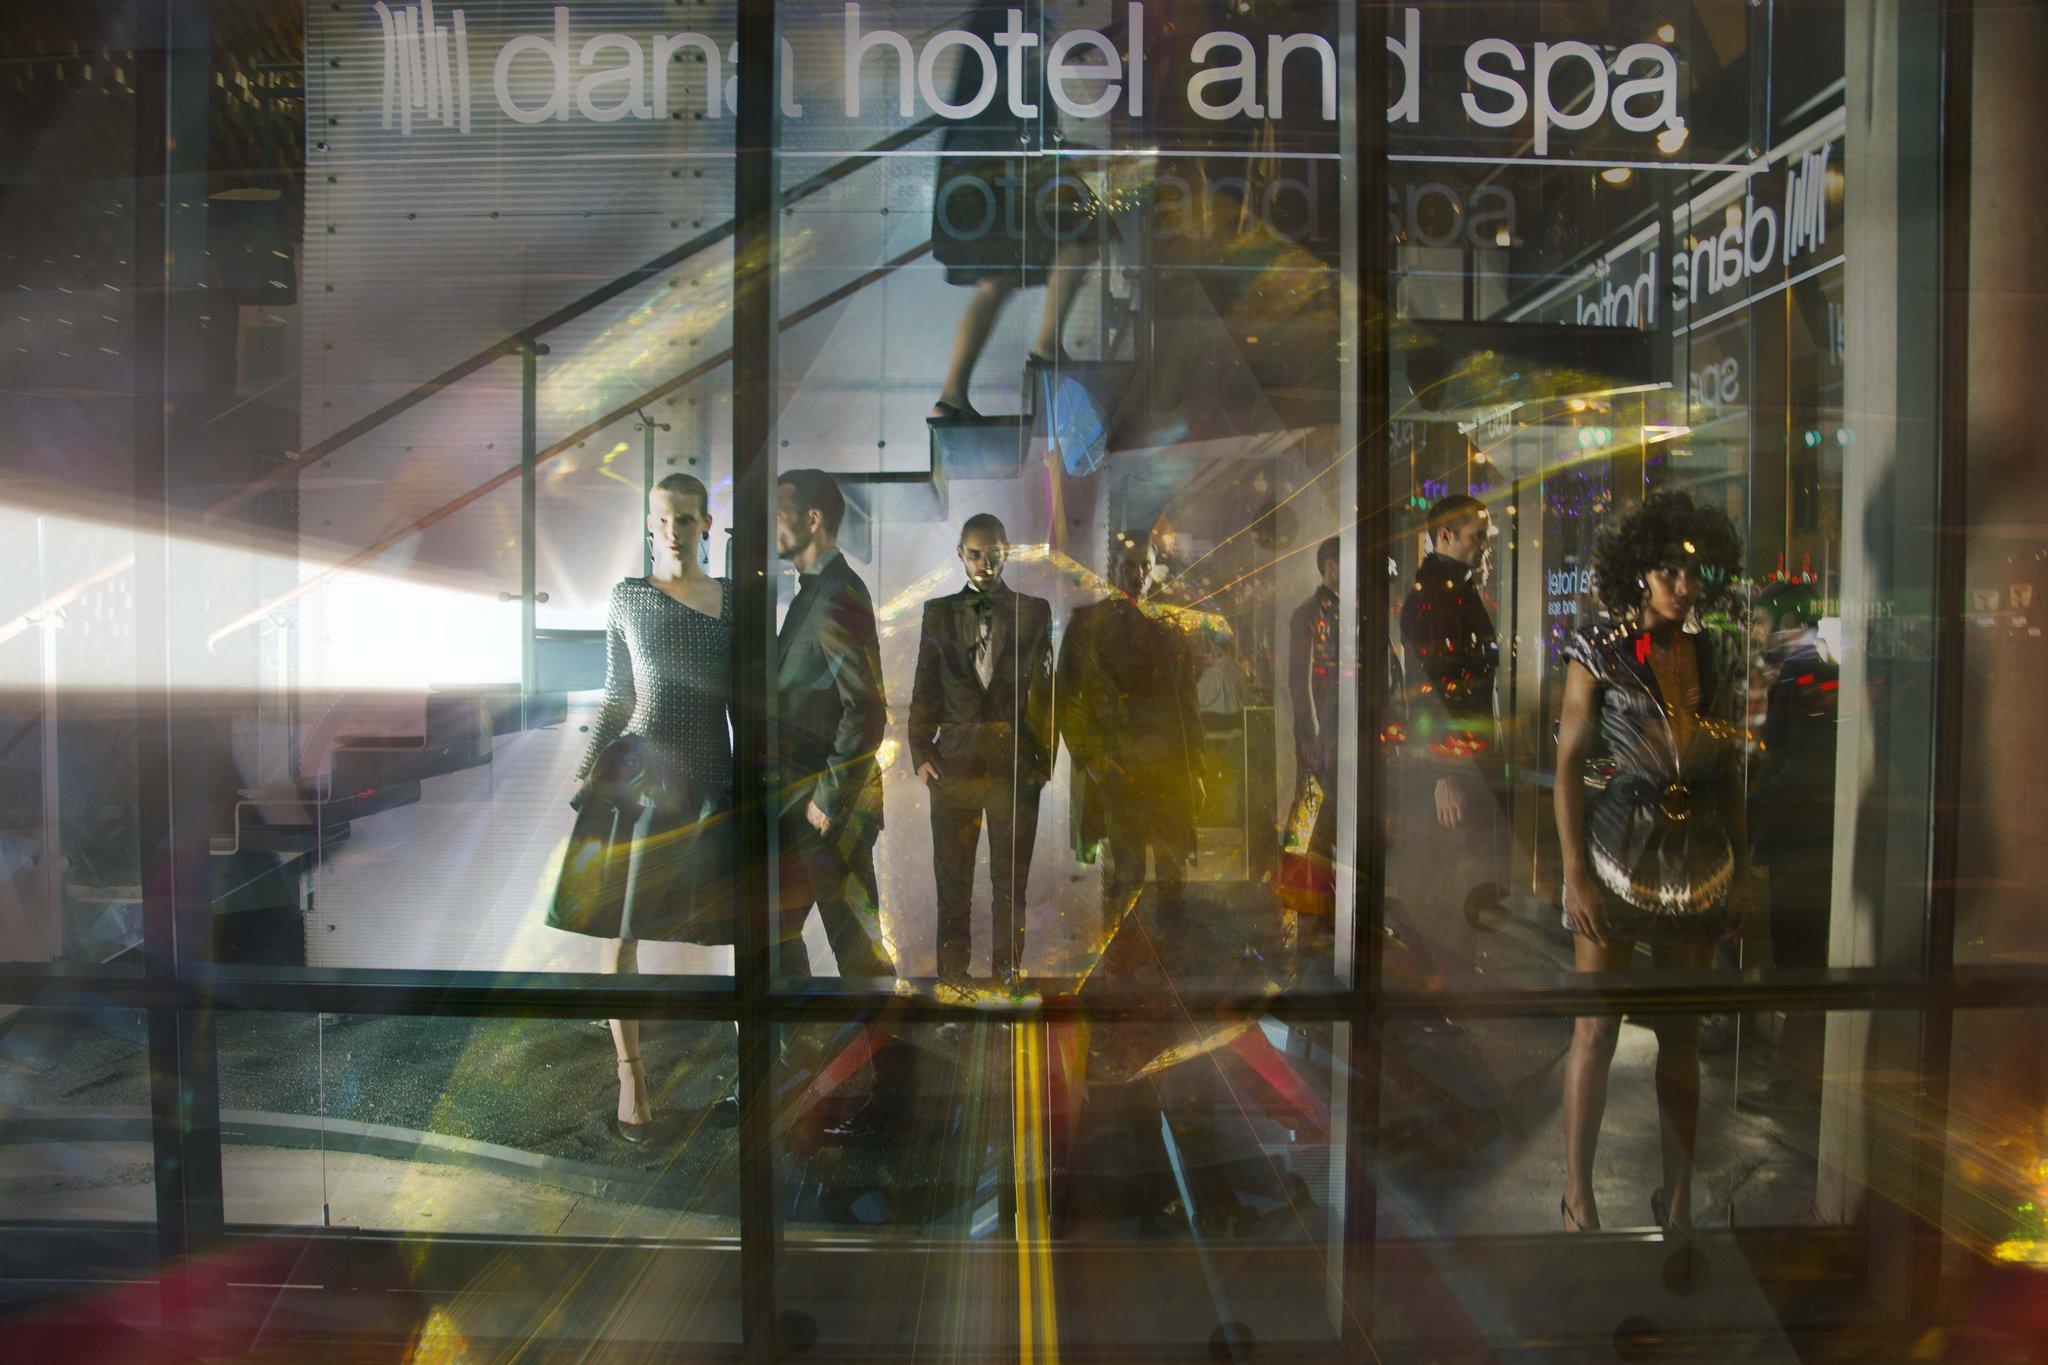 Dana Hotel & Spa